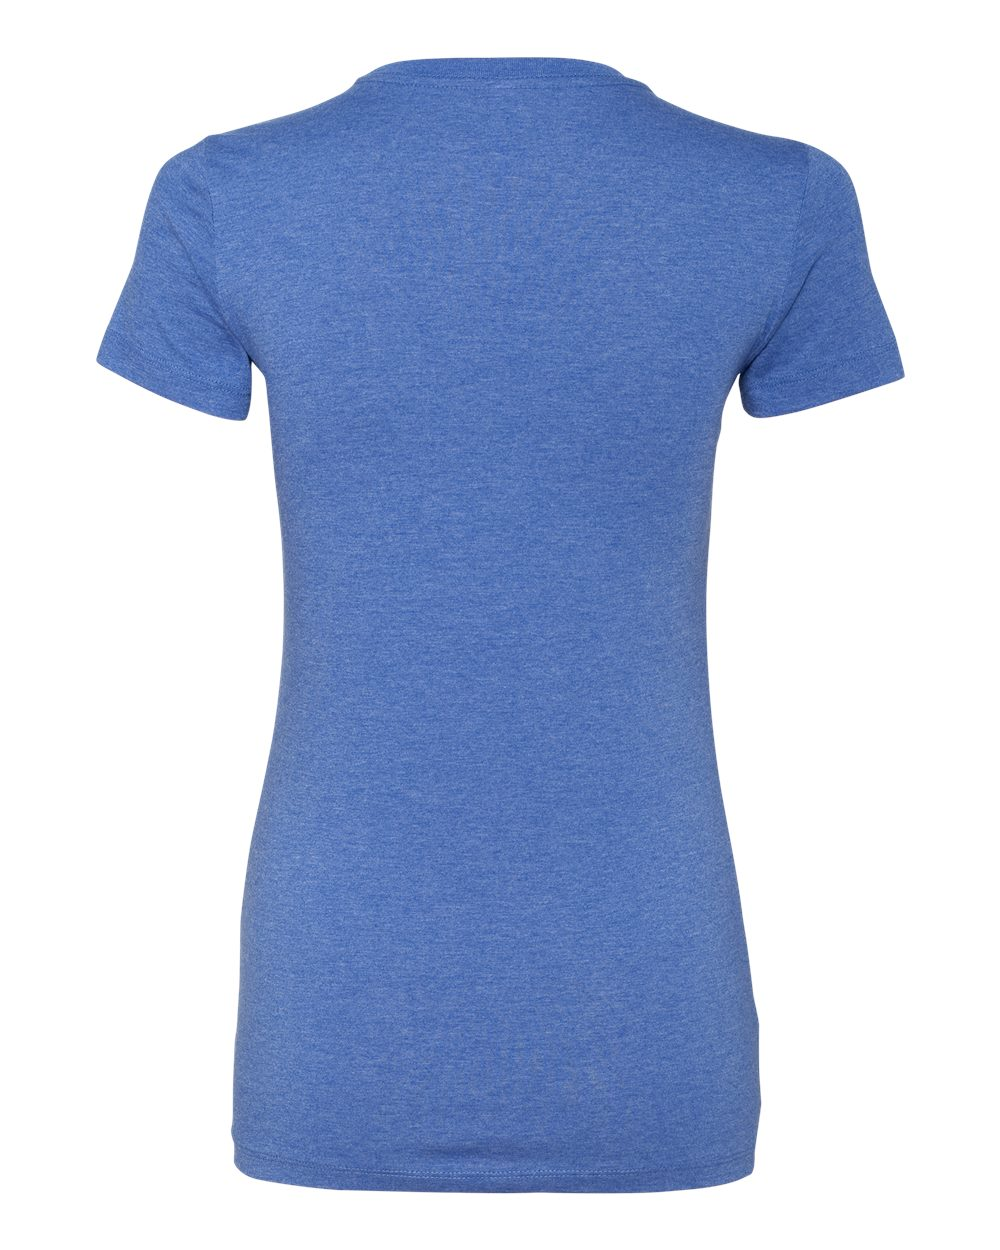 Bella Canvas Womens The Favorite T-Shirt 6004 Size S-2XL